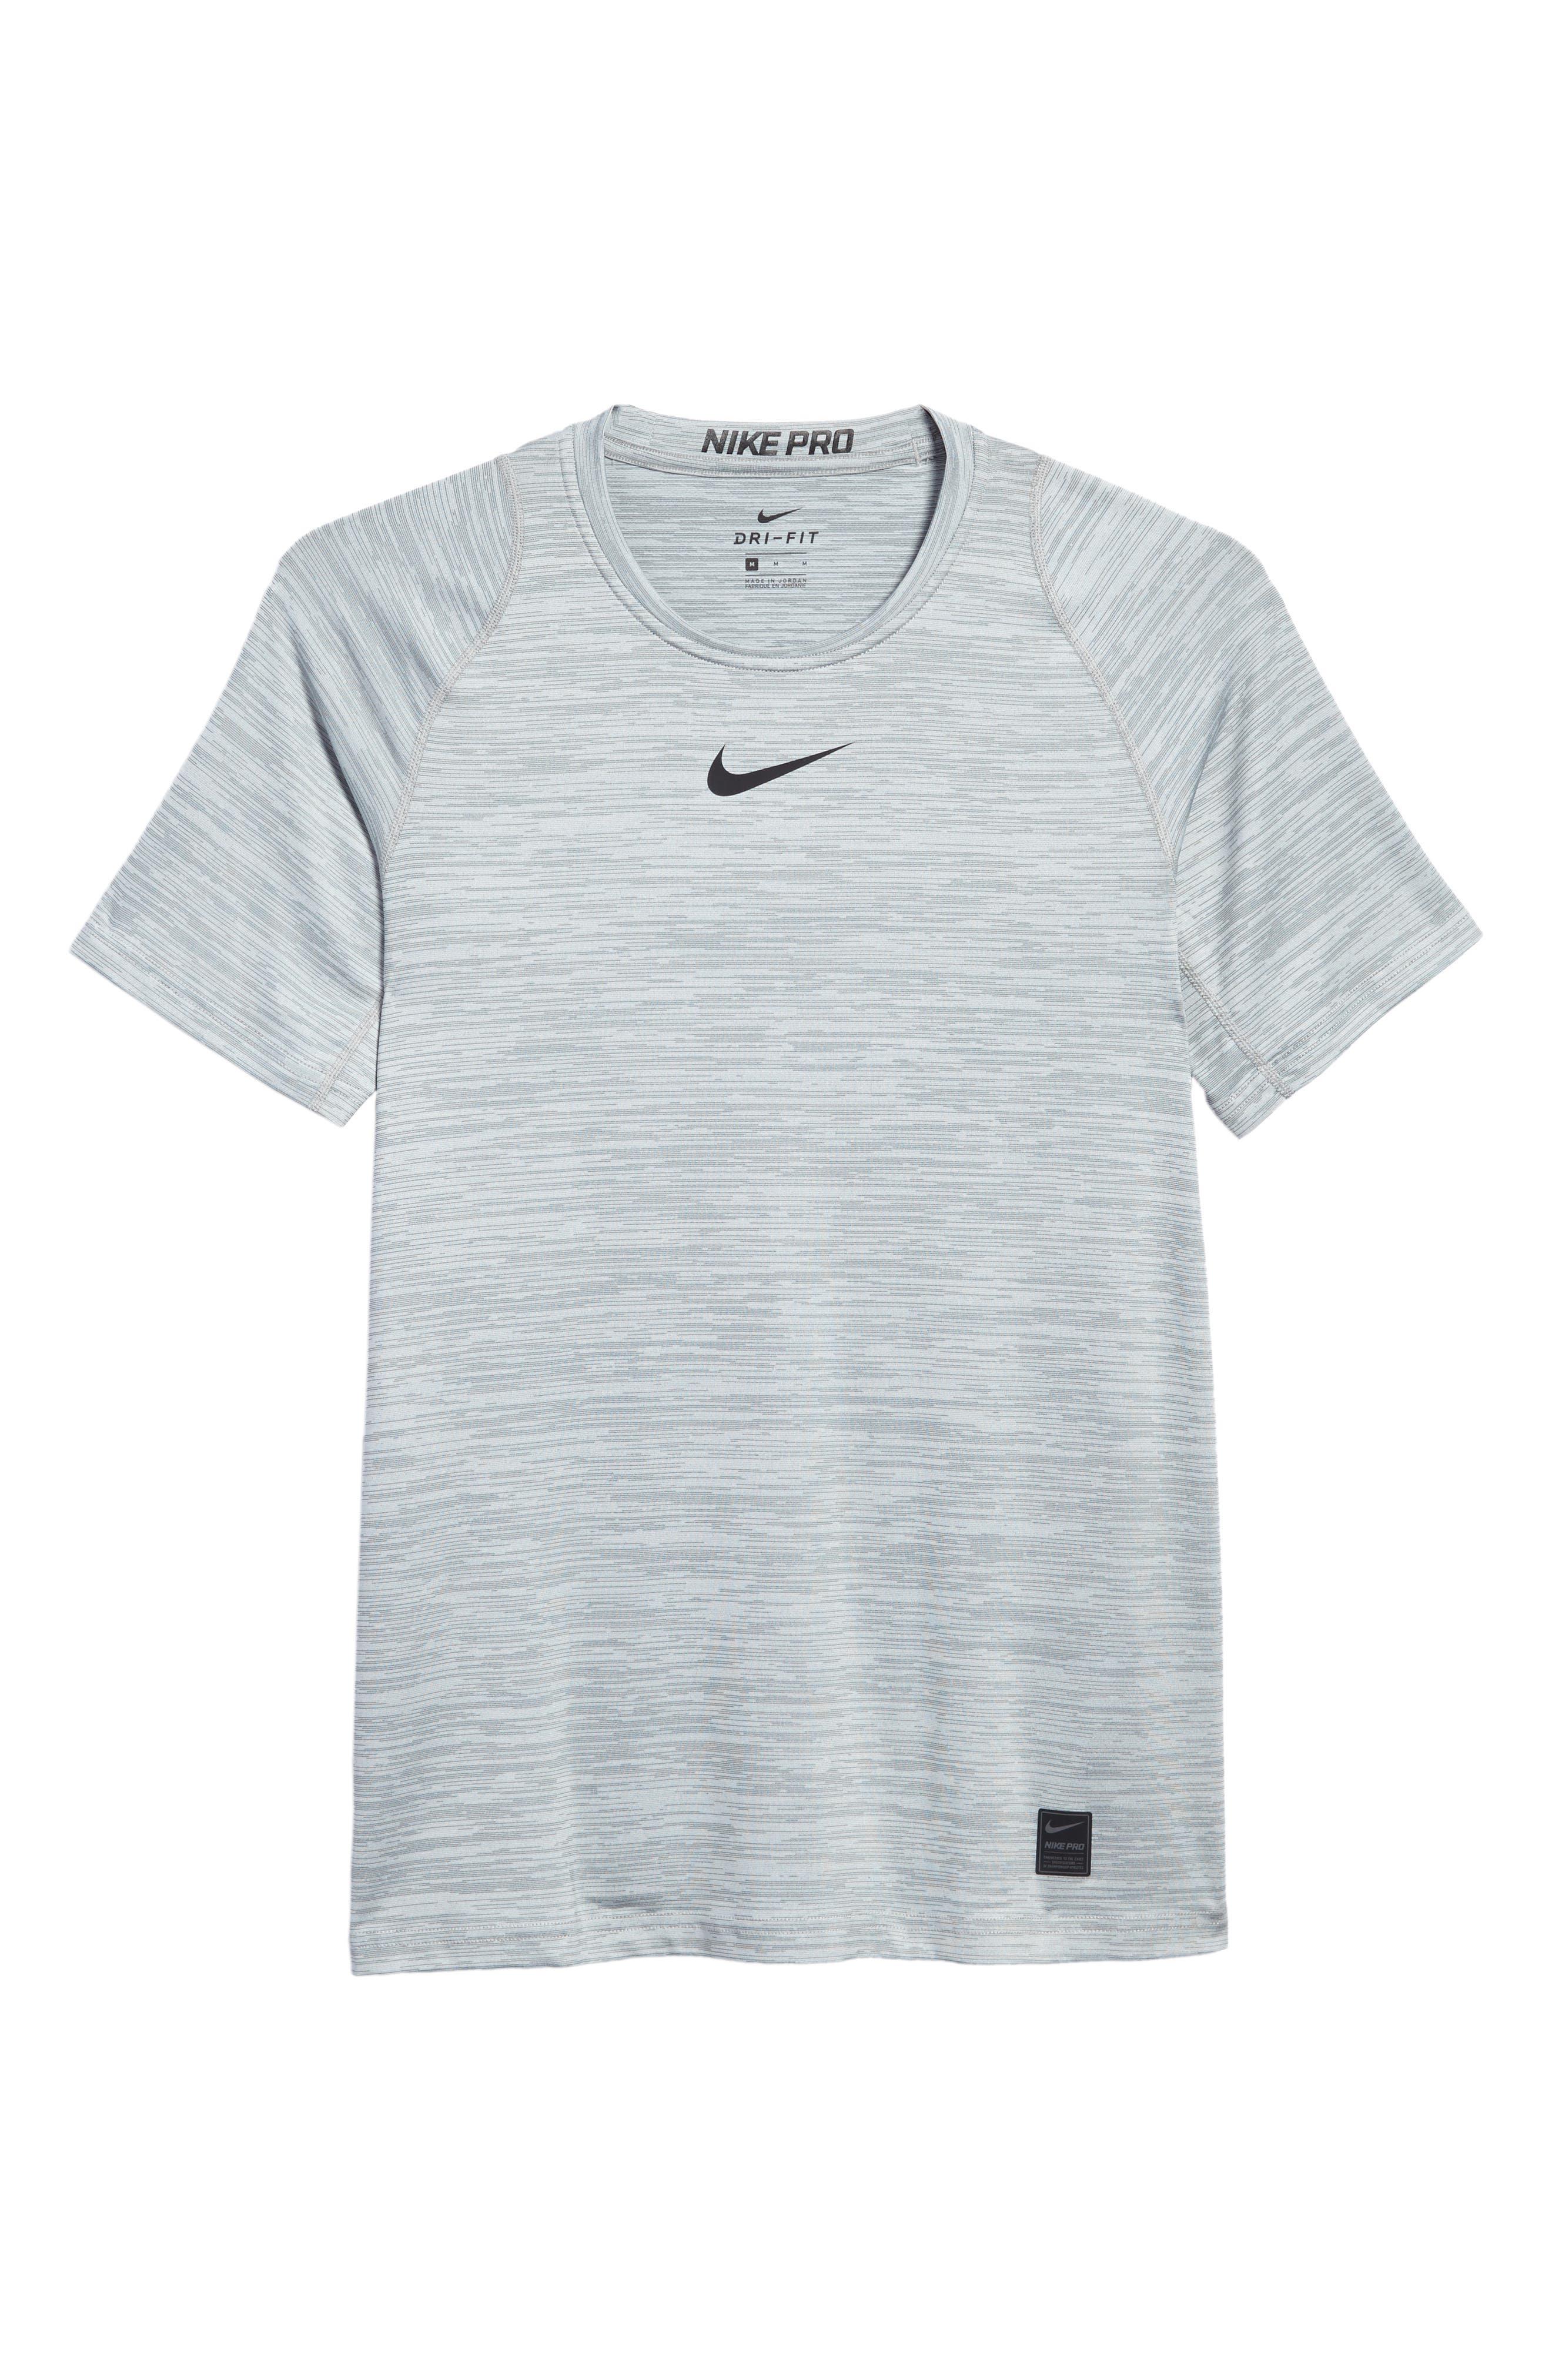 Training Top Crewneck T-Shirt,                             Alternate thumbnail 6, color,                             Cool Grey/ White/ Black